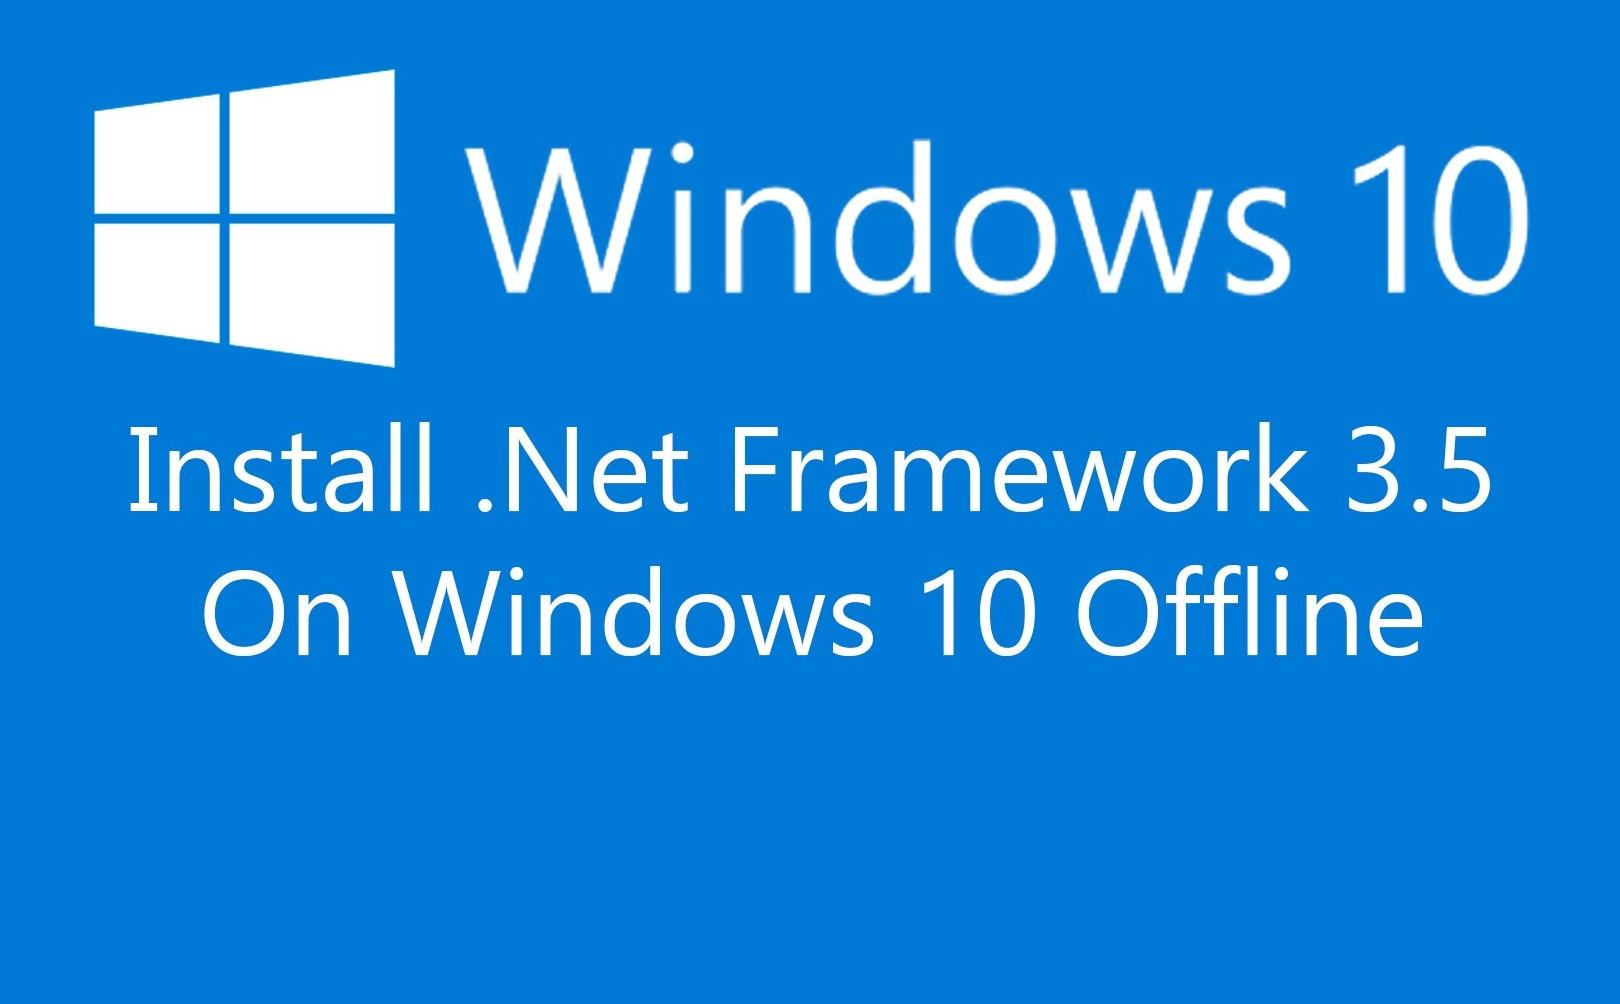 Installare Offline le .NET Framework 3.5 in Windows 10 usando DISM